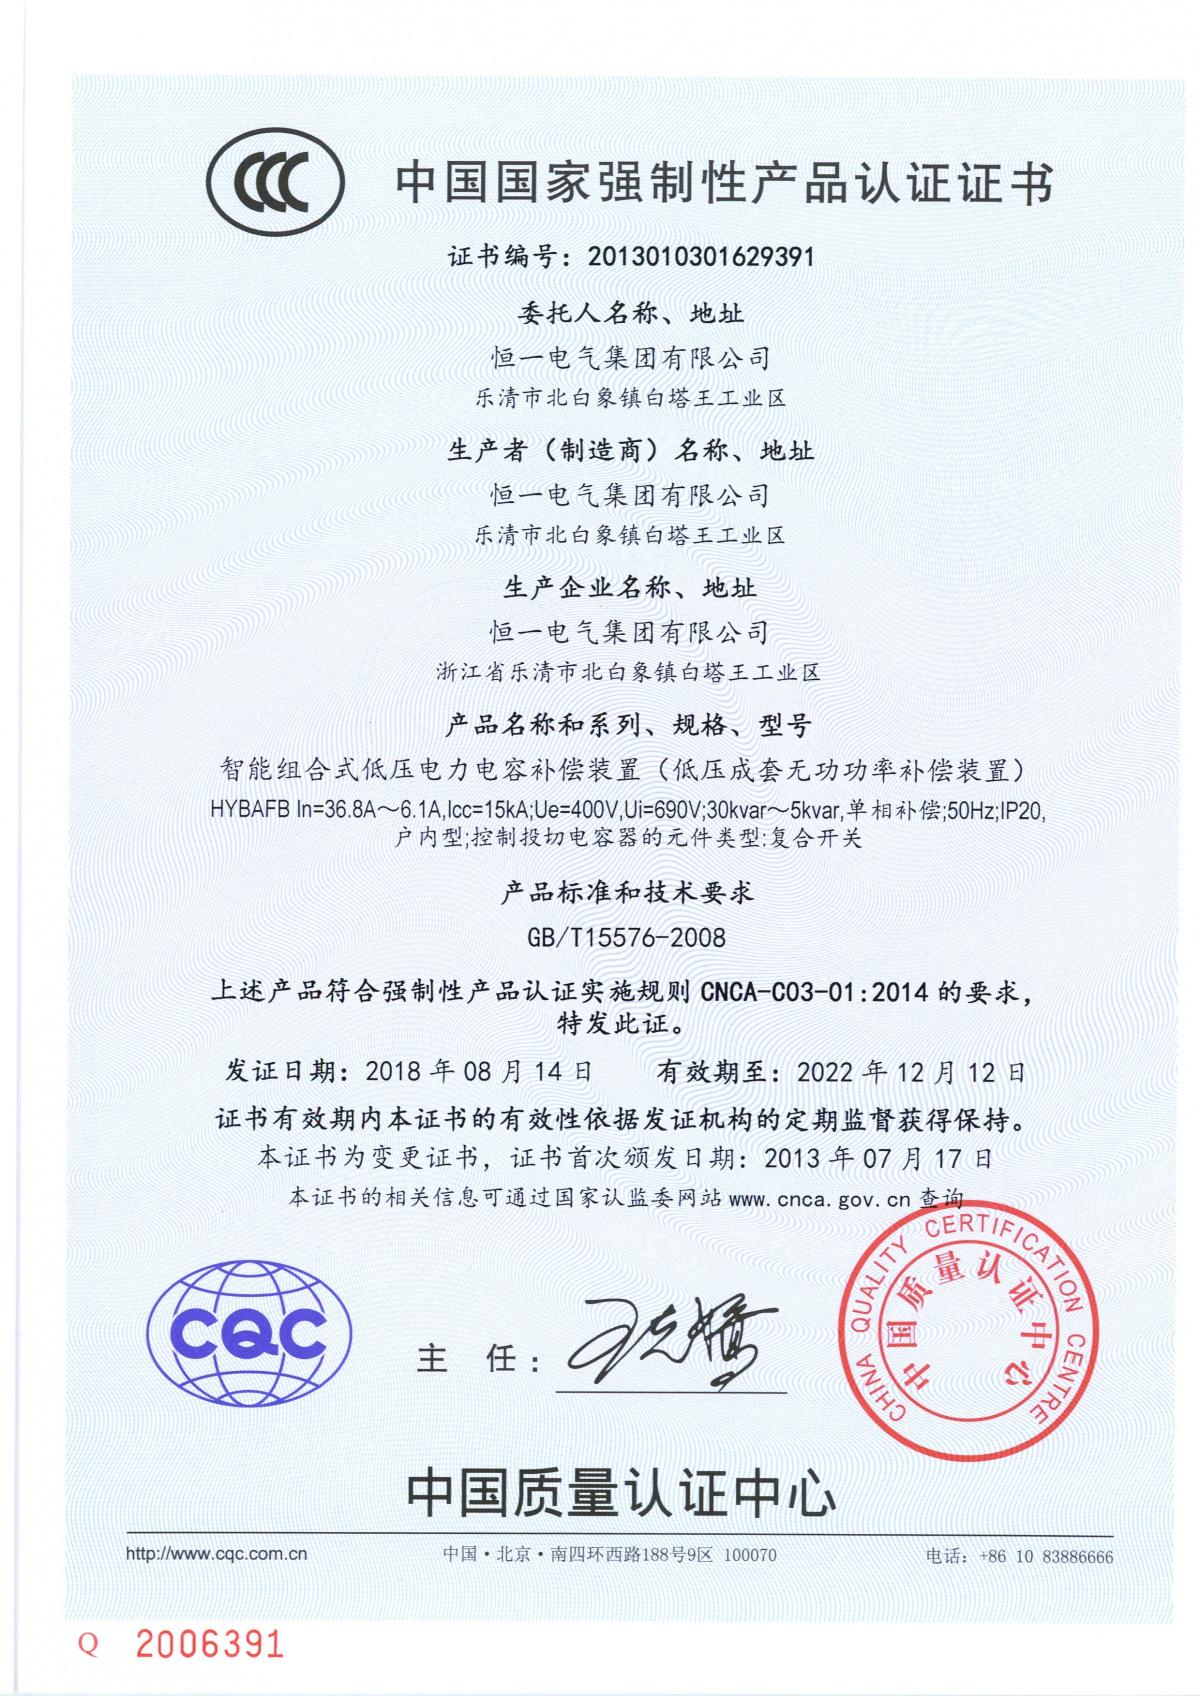 HYBAFB 15KA 中文2018.08